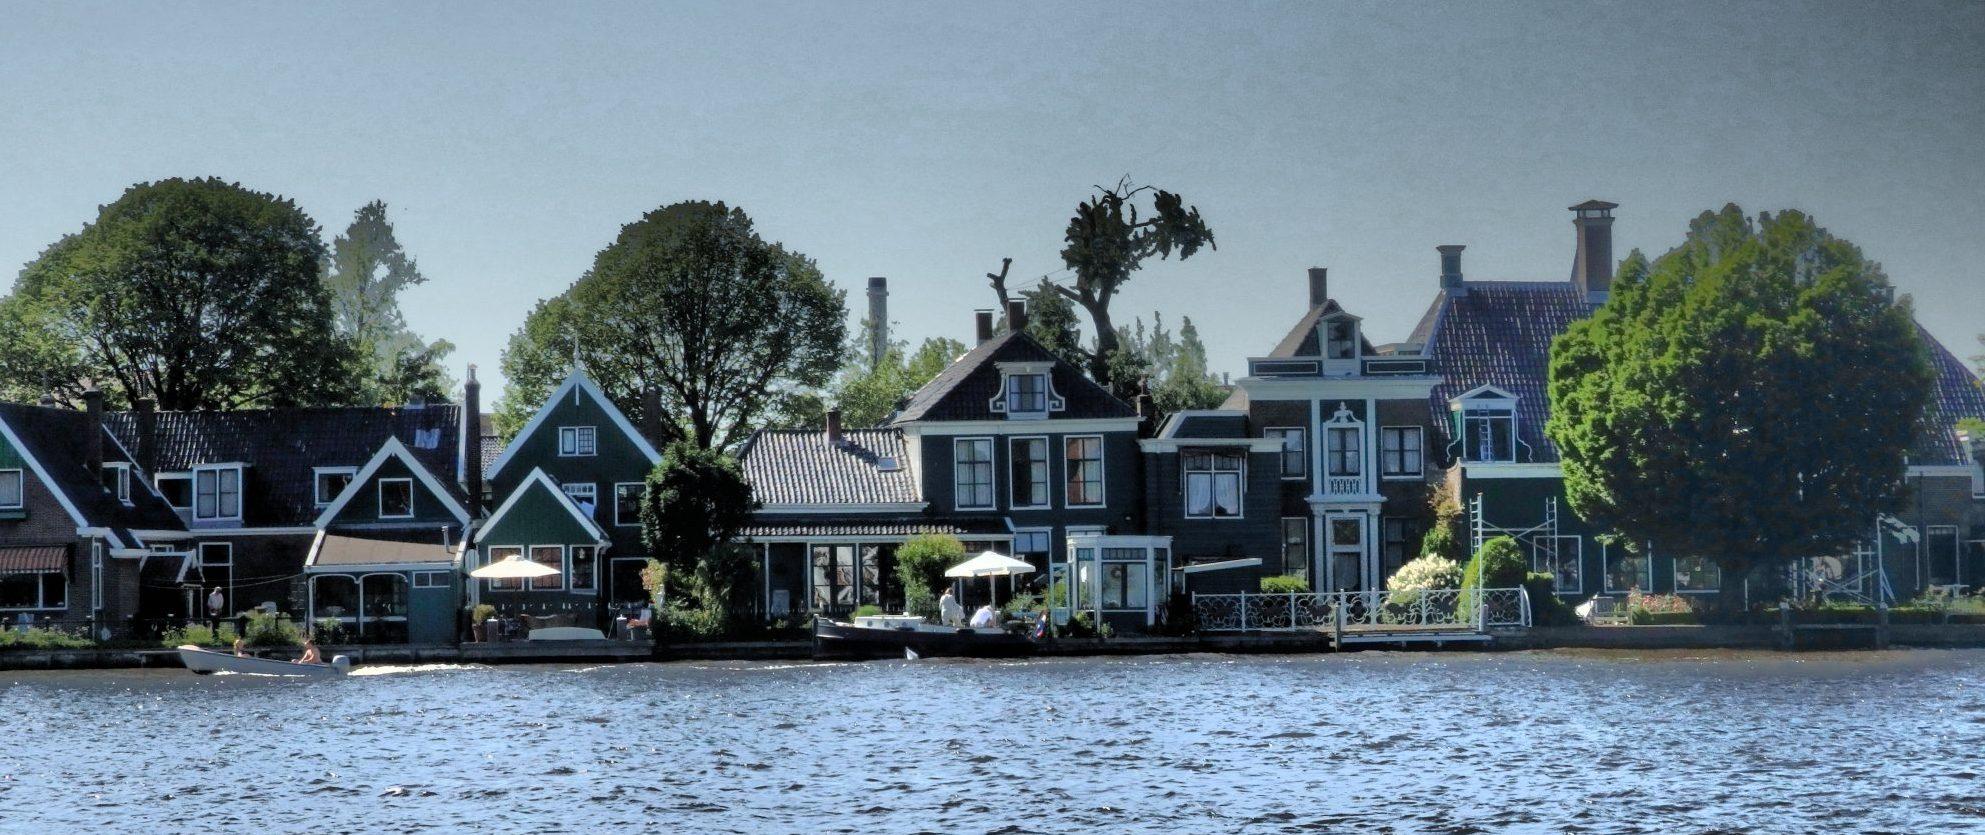 houses across the river from Zaanse Schans